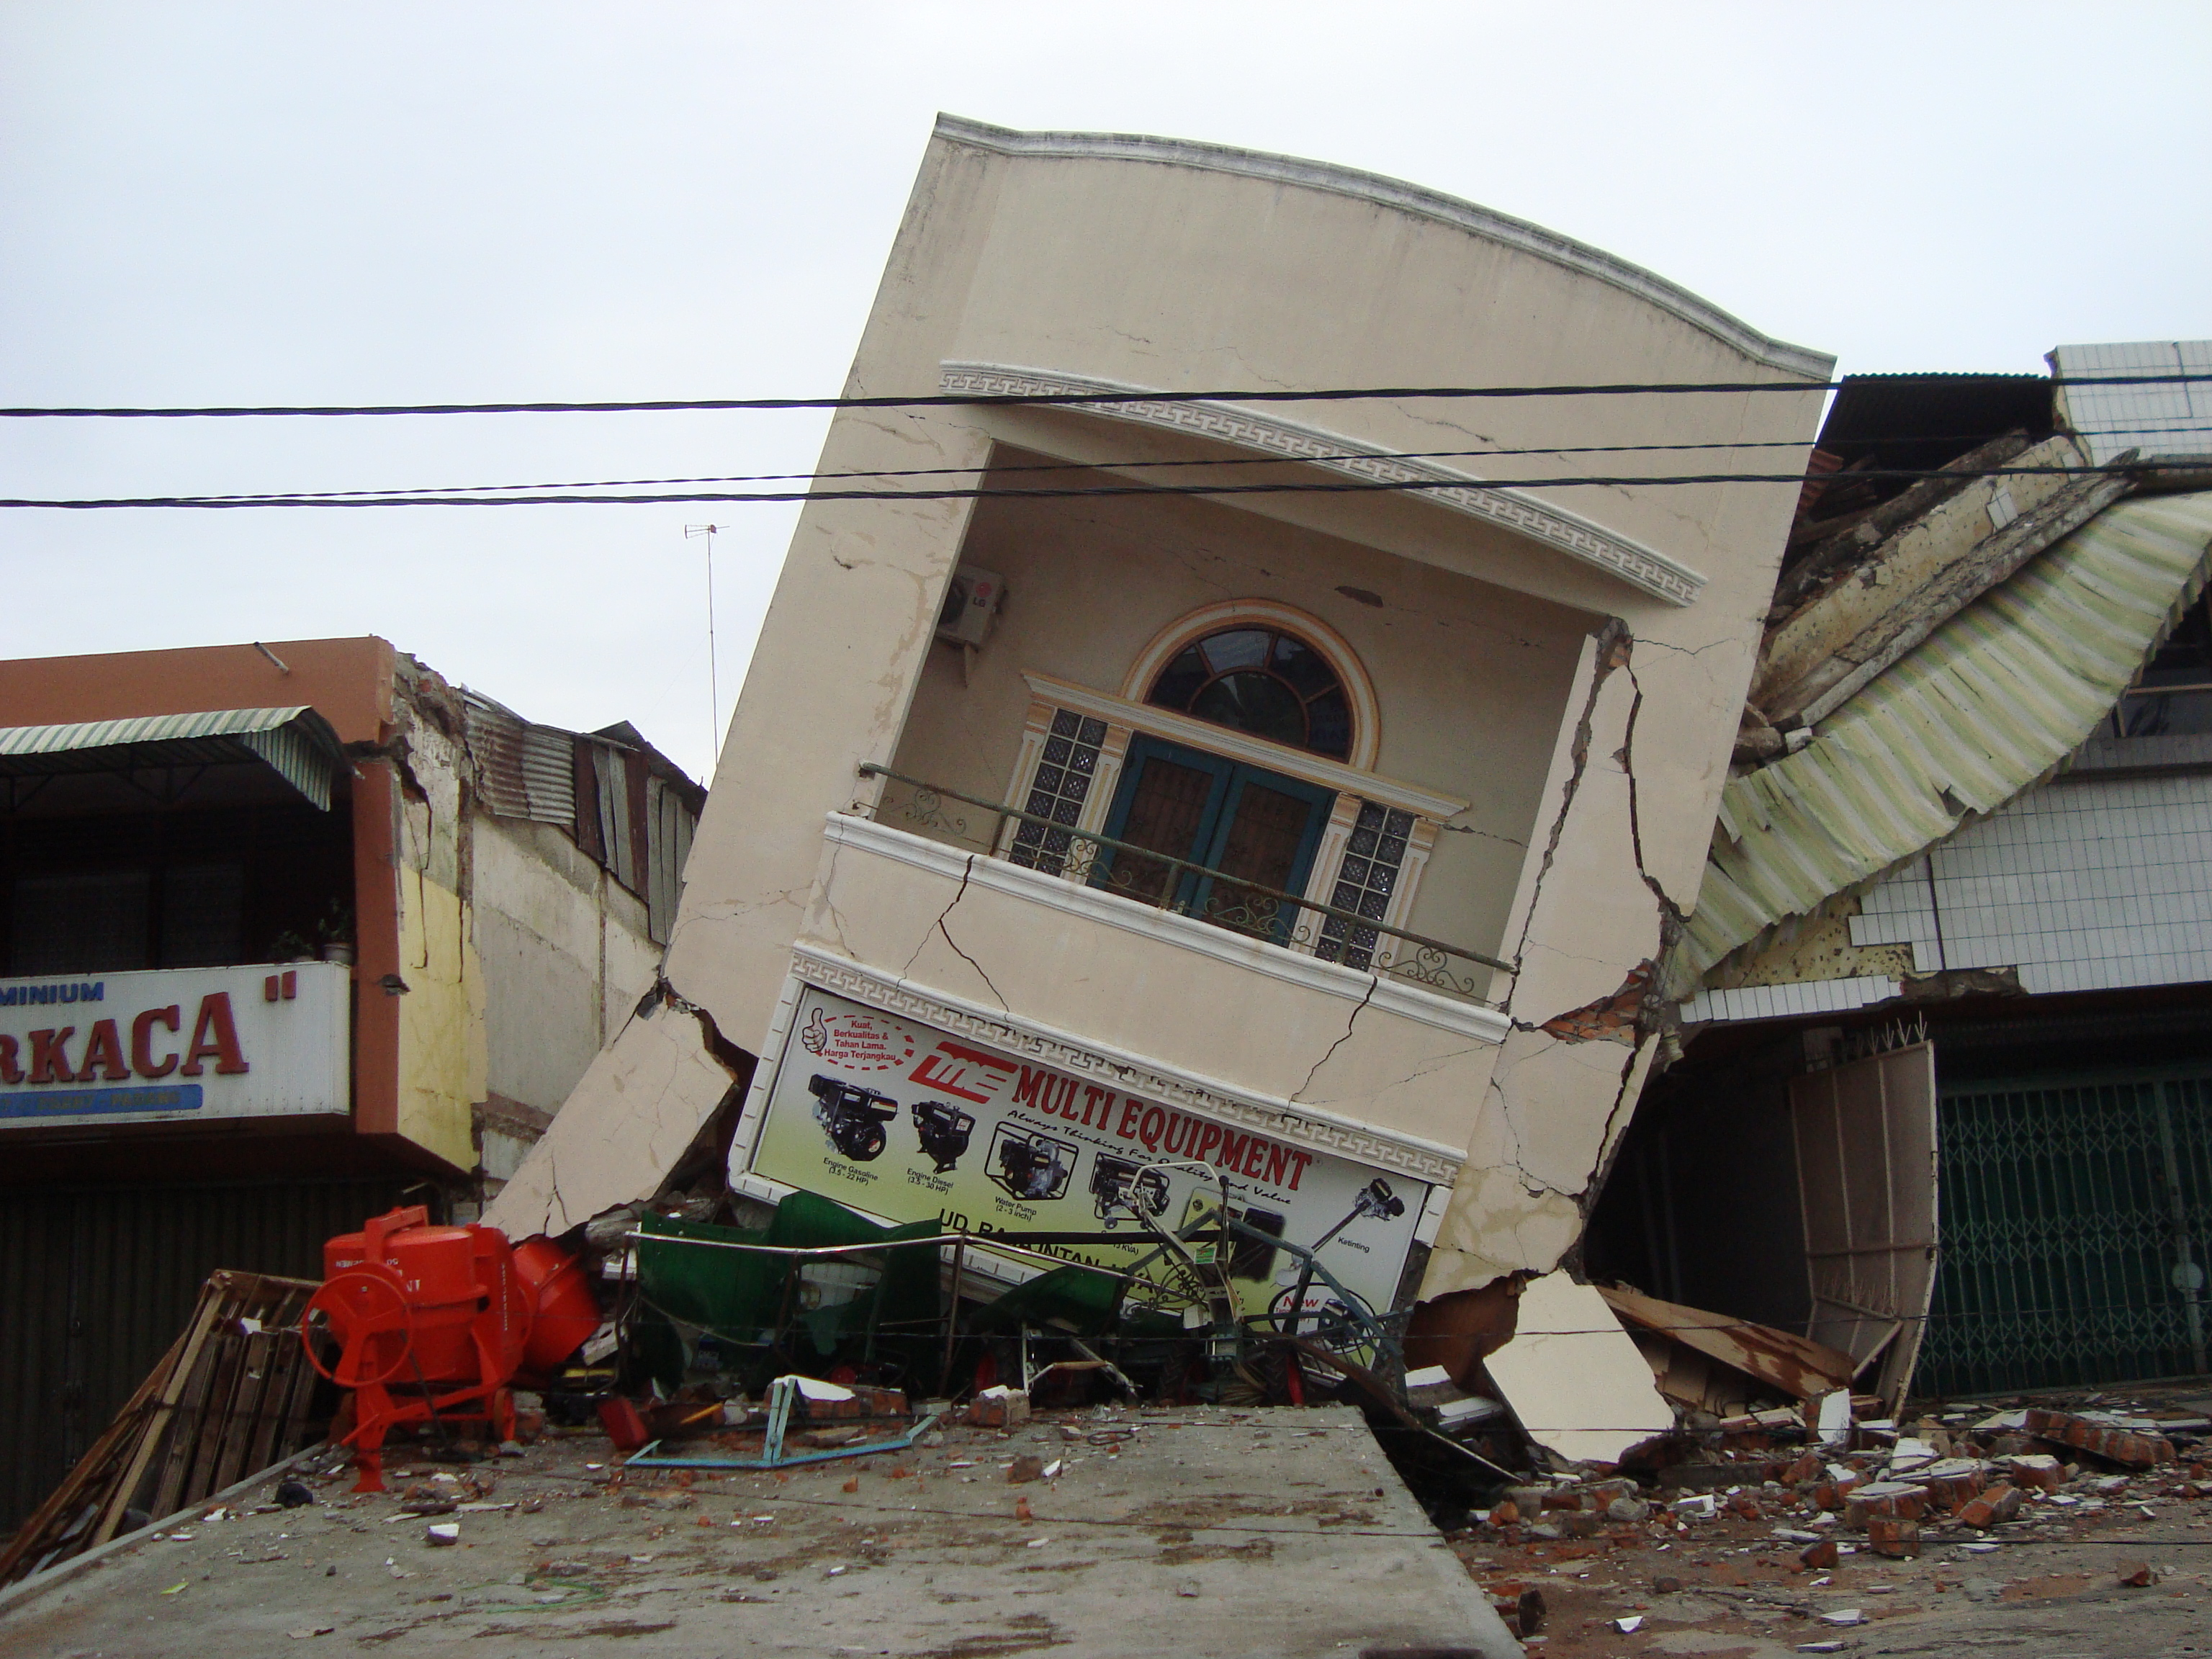 File:2009 earthquake damage in Padang (8).JPG - Wikimedia